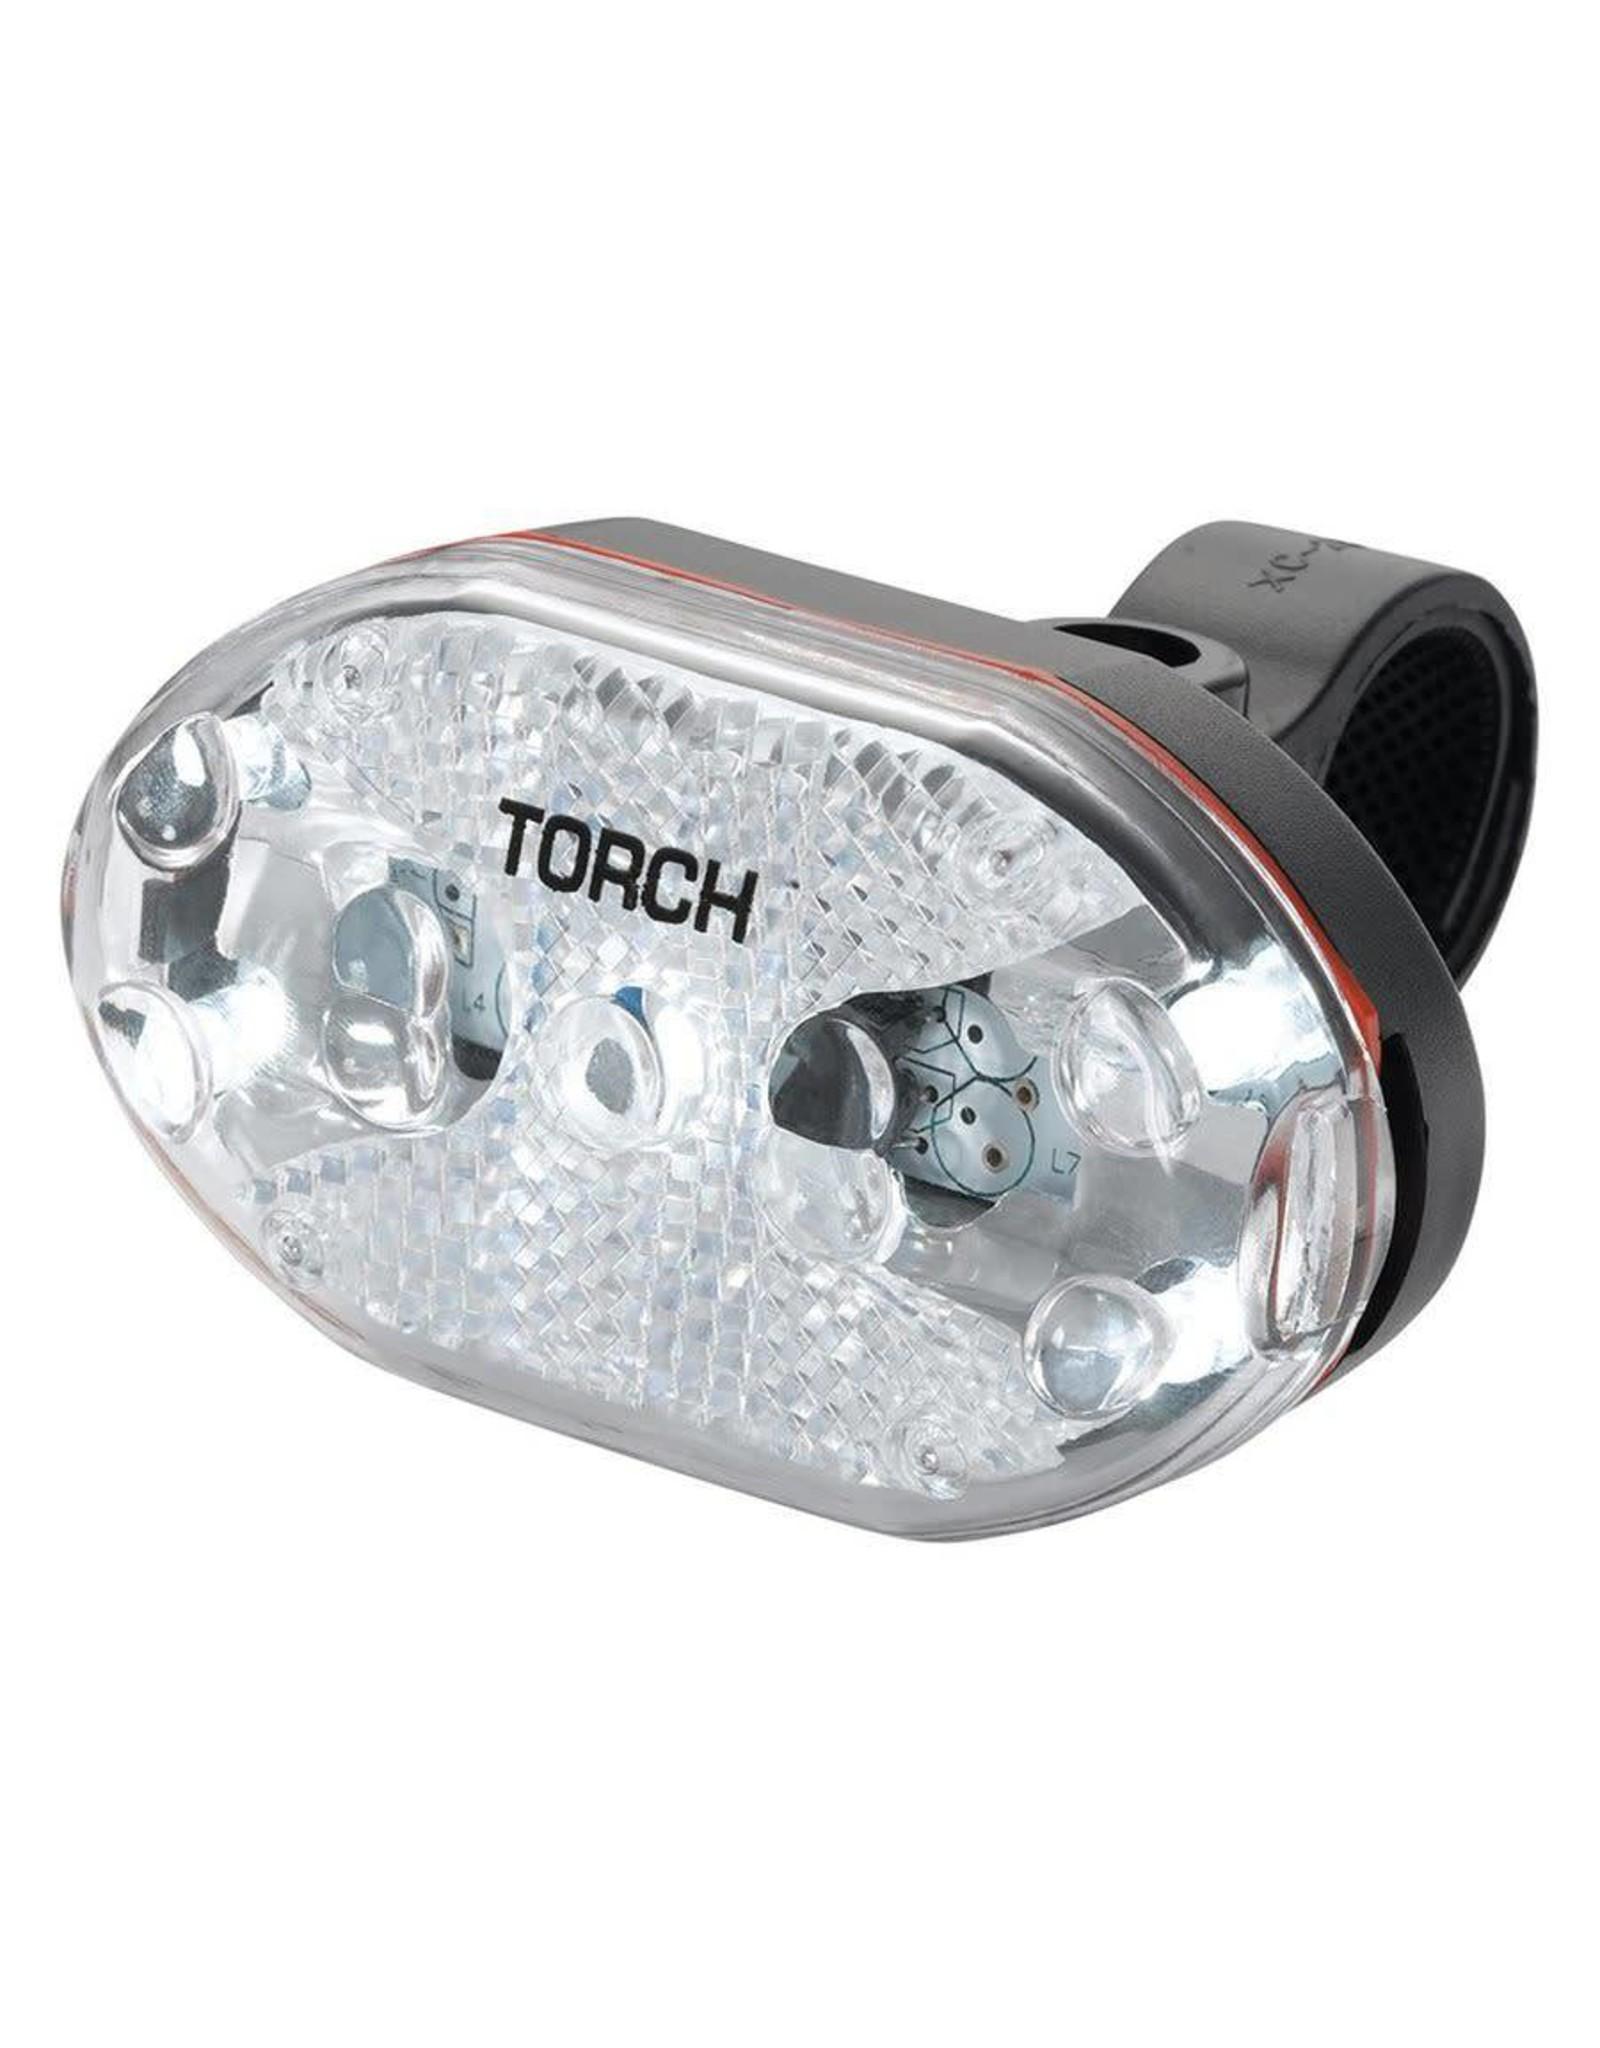 Torch White Bright 5X